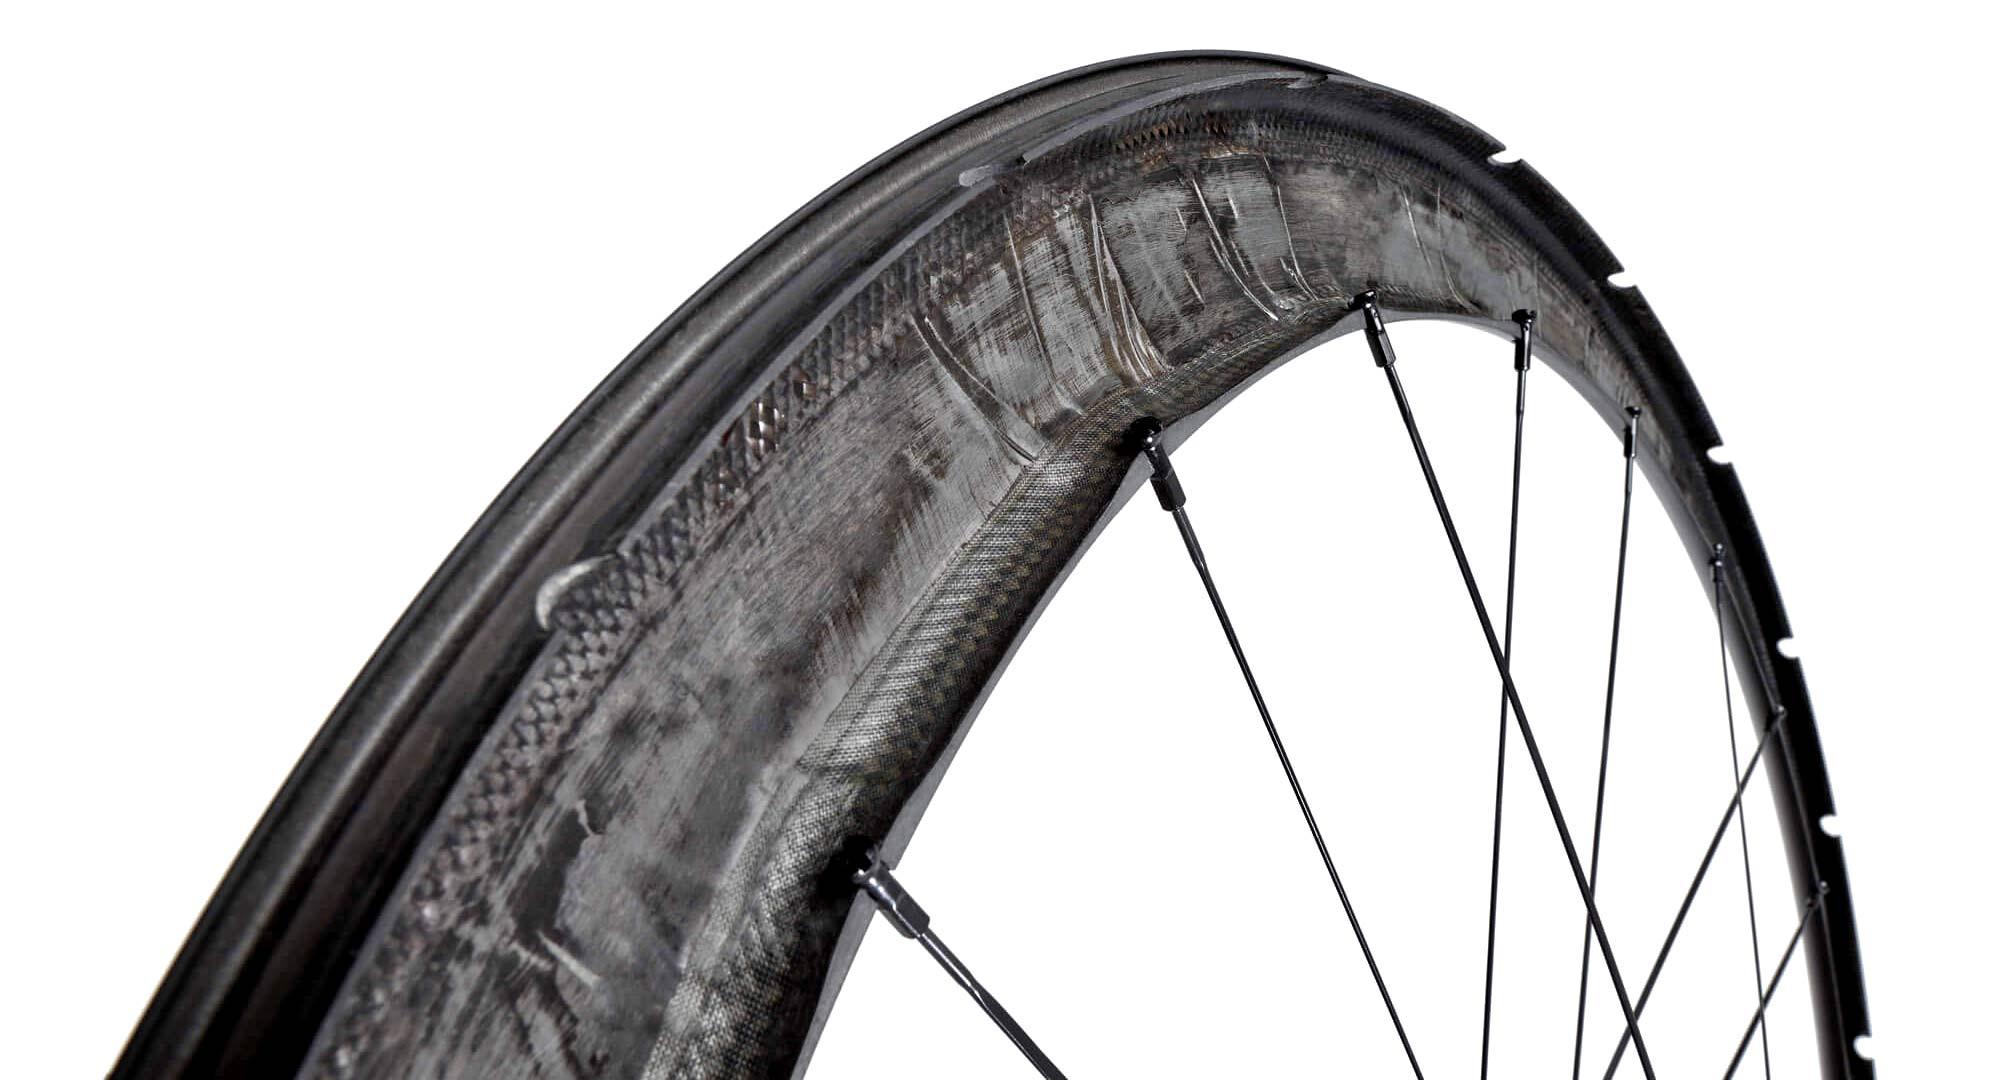 Scope All-Road aero carbon gravel bike wheels, lightweight aerodynamic tubeless carbon layup